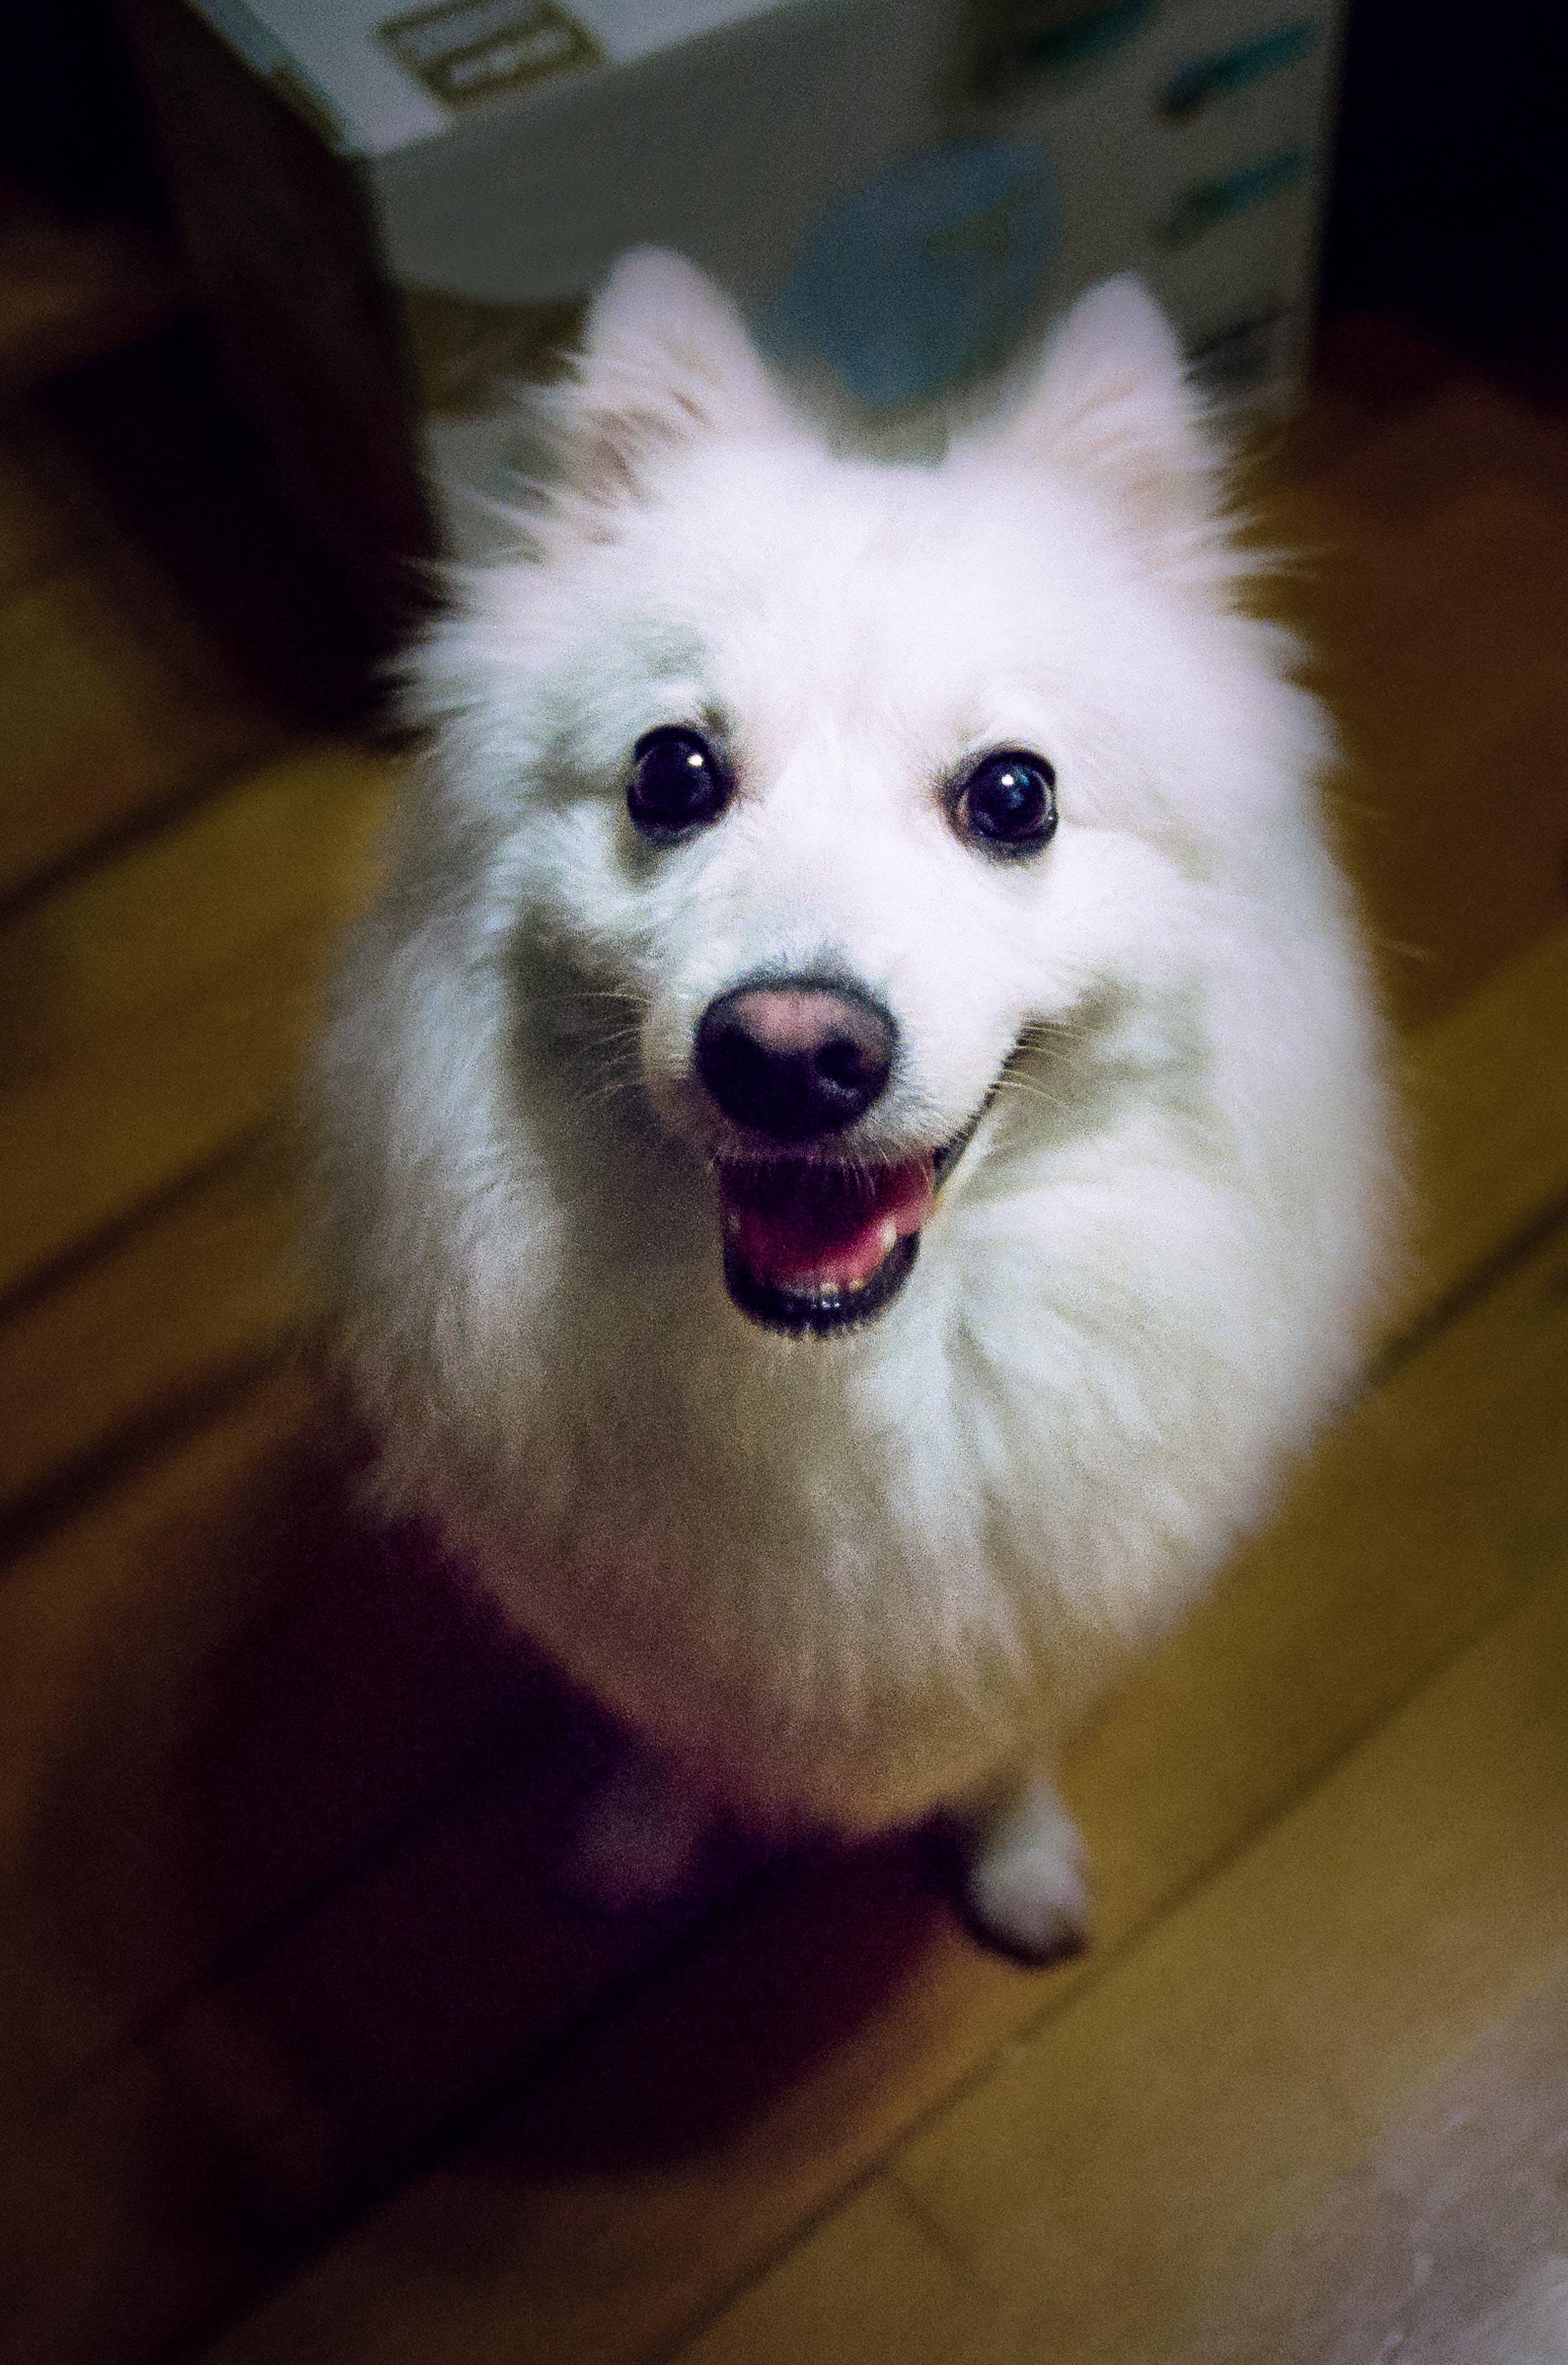 Free stock photo of animal, cute, dog, expectation